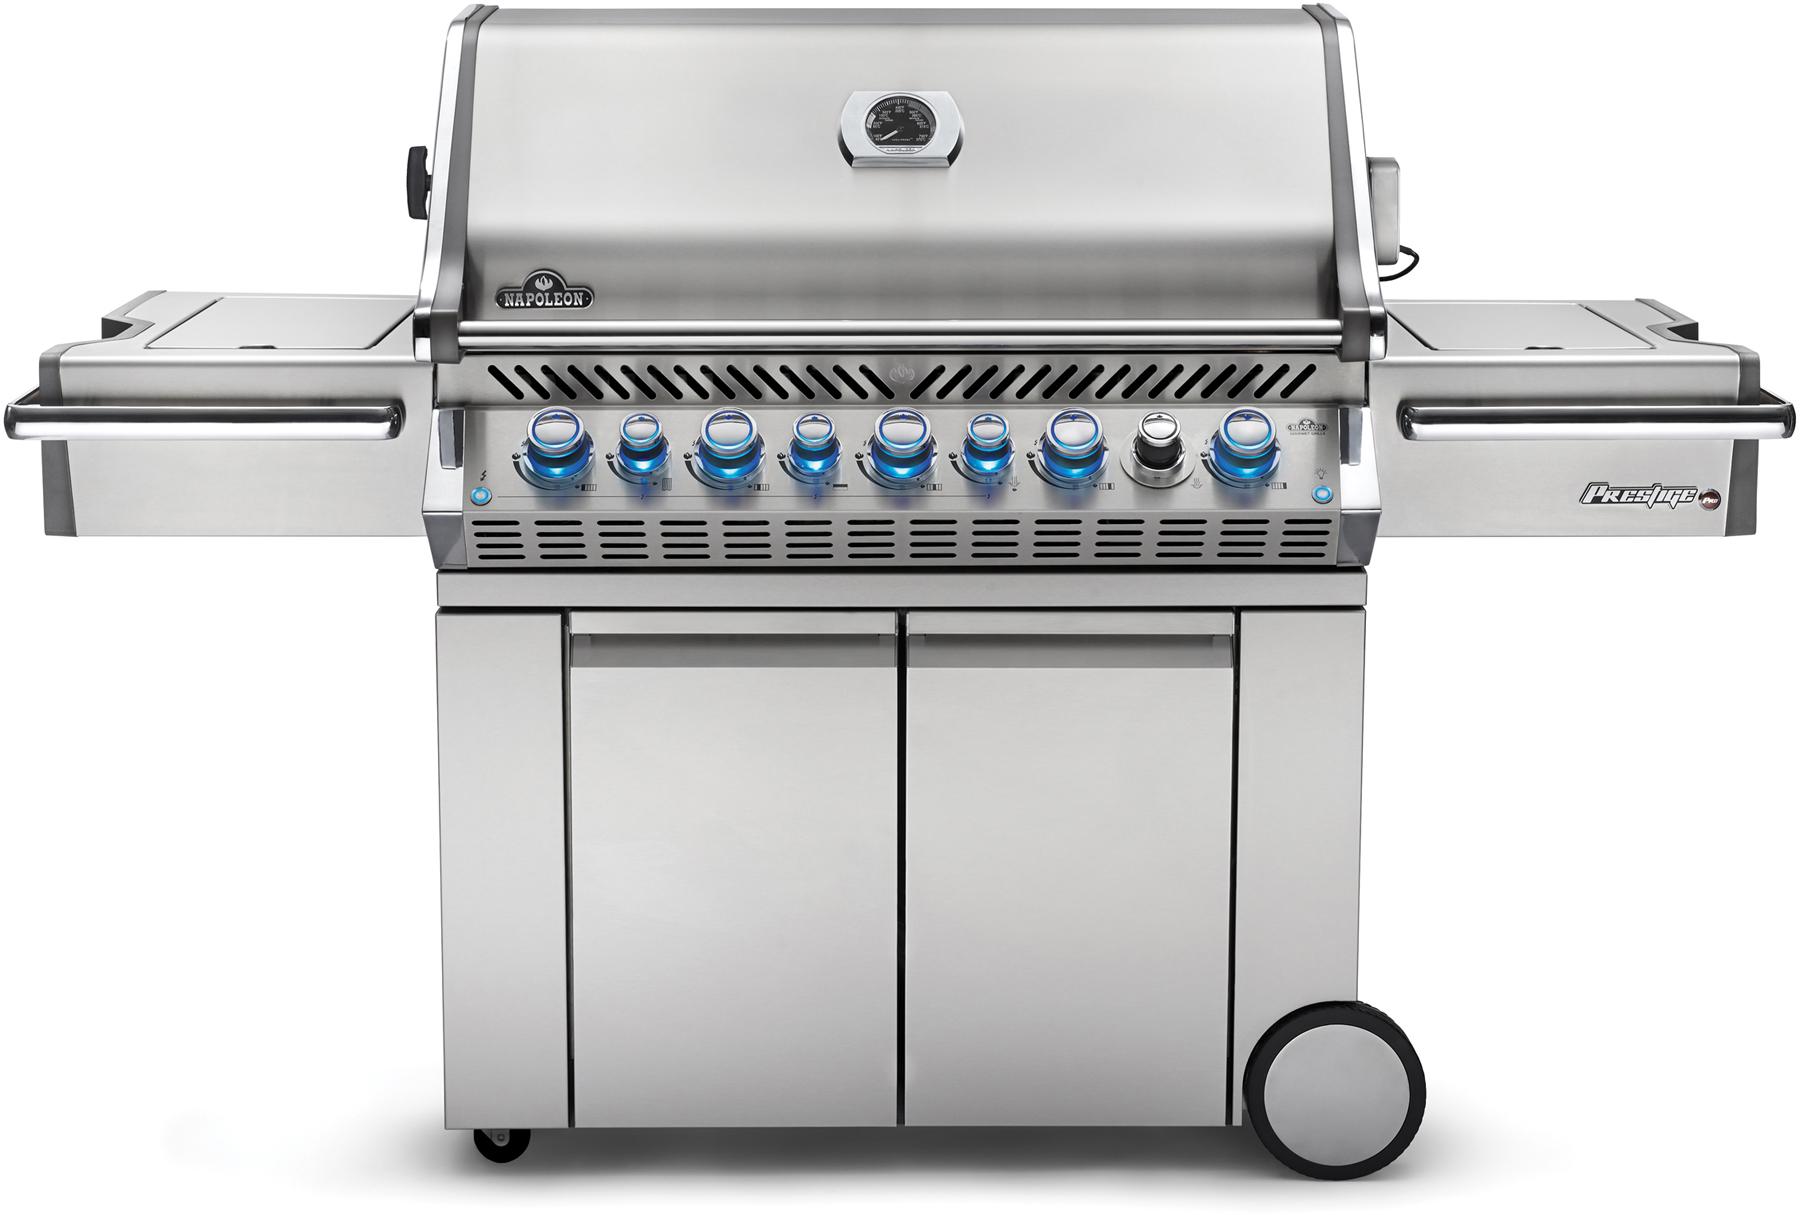 Outdoor Küche Edelstahl Napoleon : Gasgrill prestige pro™ rsib edelstahl gasgrill grill bbq